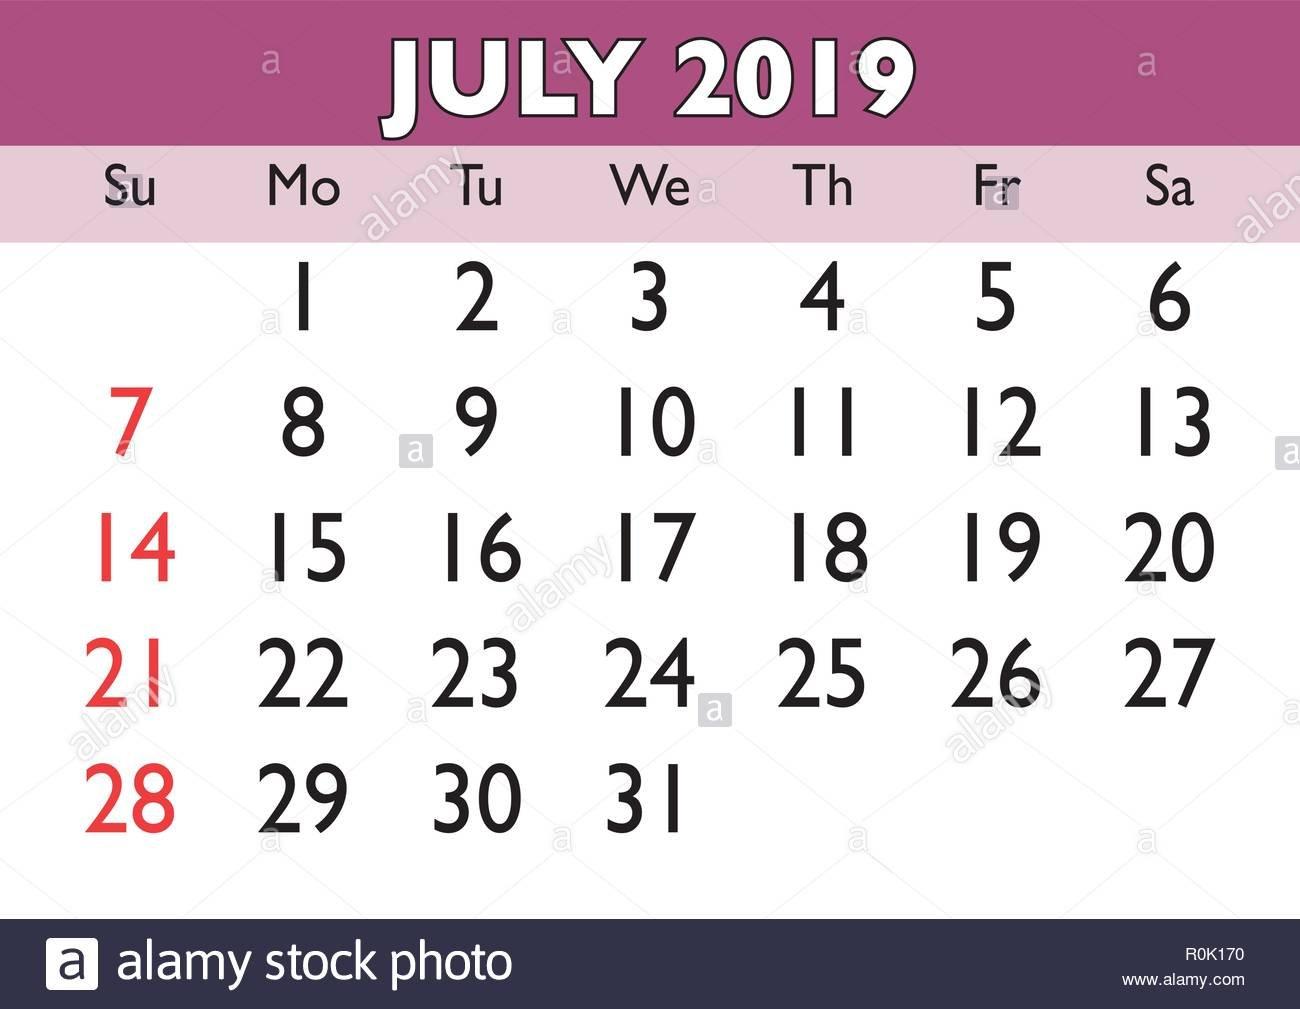 July 2019 Calendar Stock Photos & July 2019 Calendar Stock Images July 4 2019 Calendar